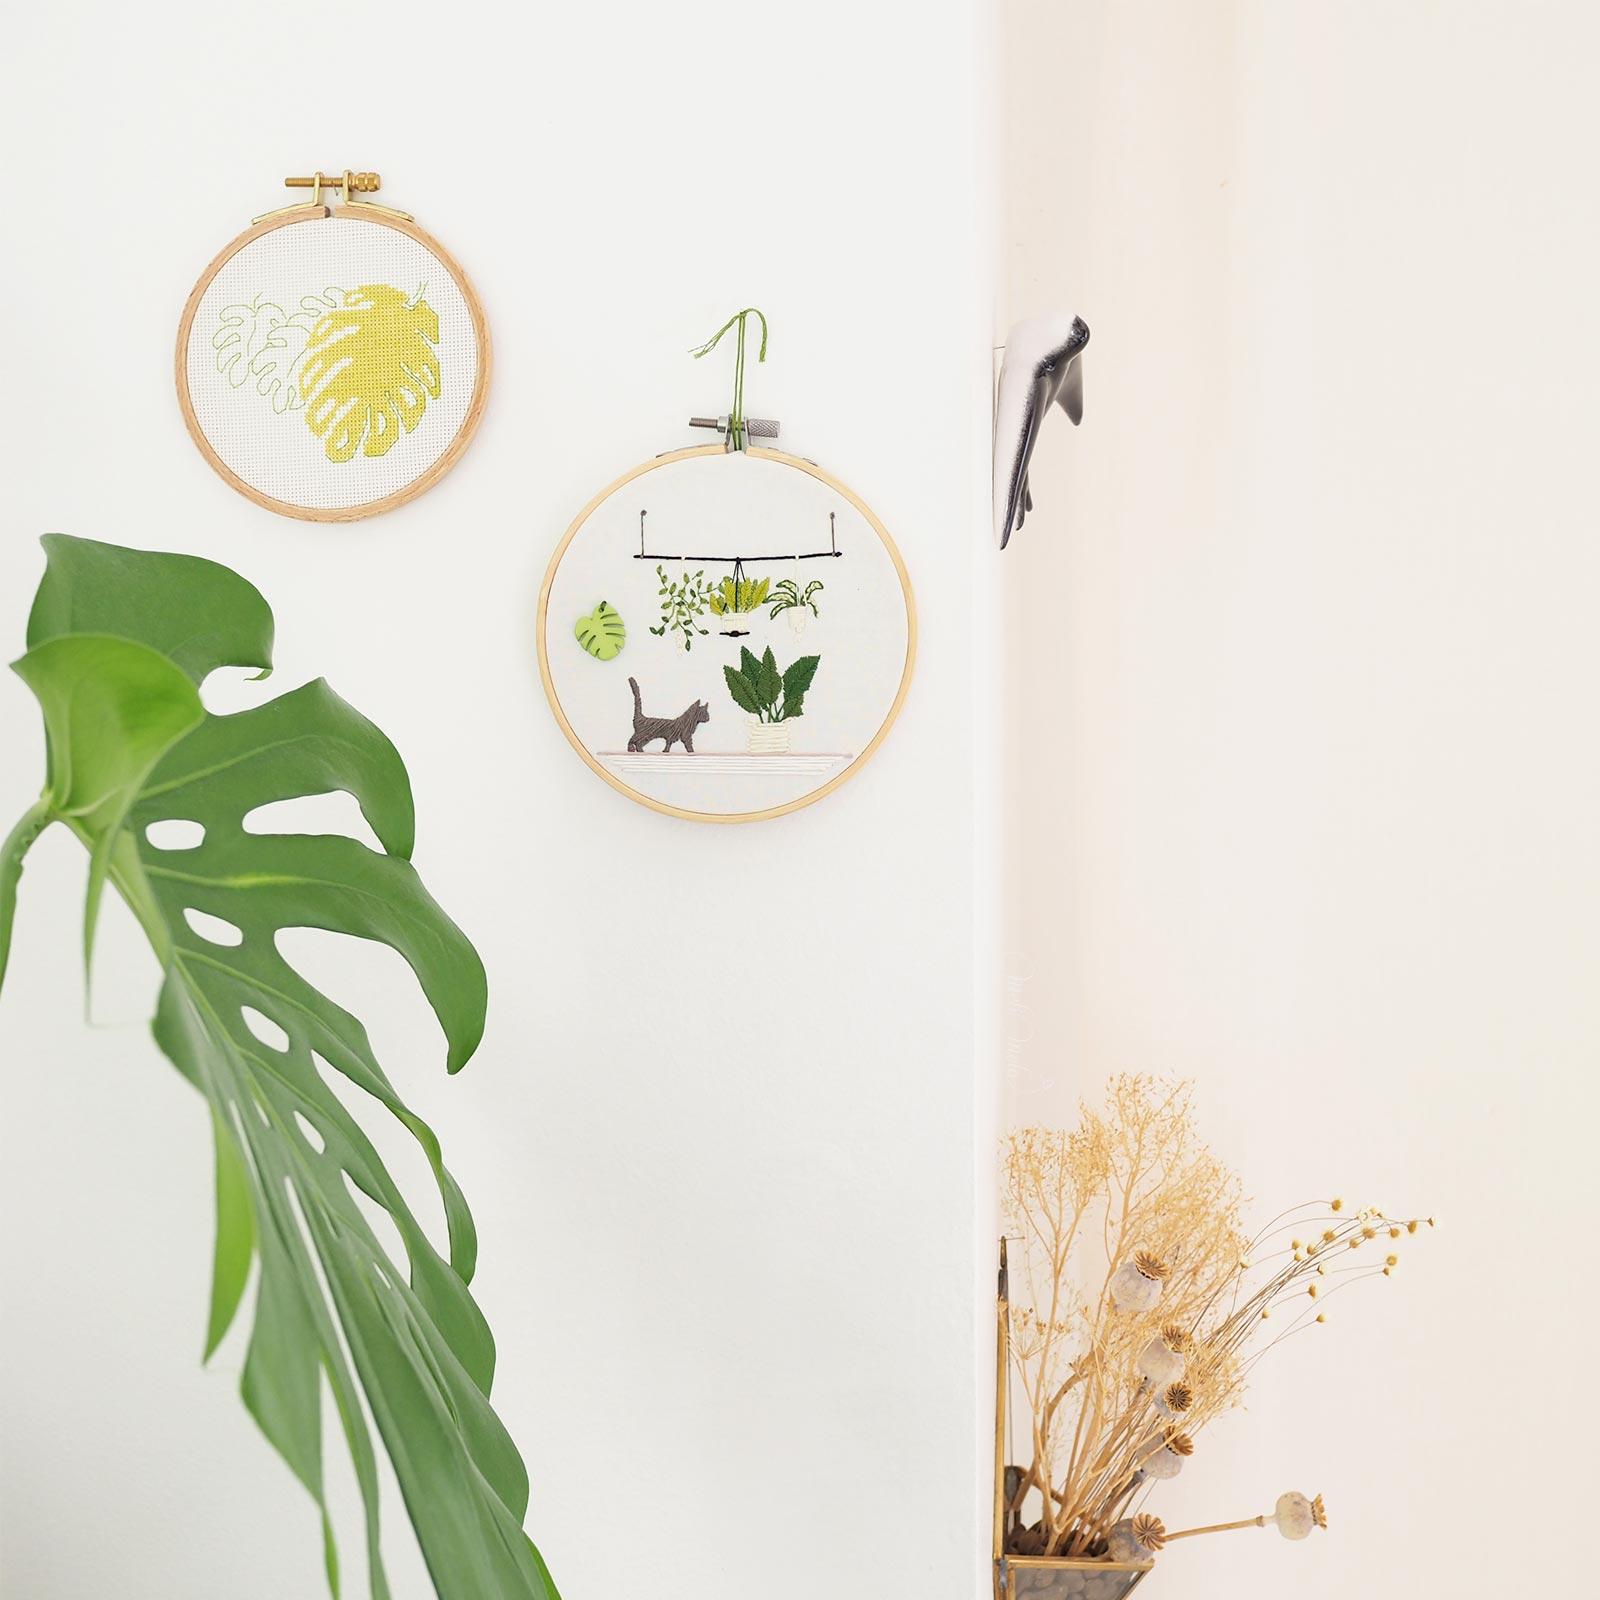 broderie plantes monstera bouzielafee green boutique melimelo